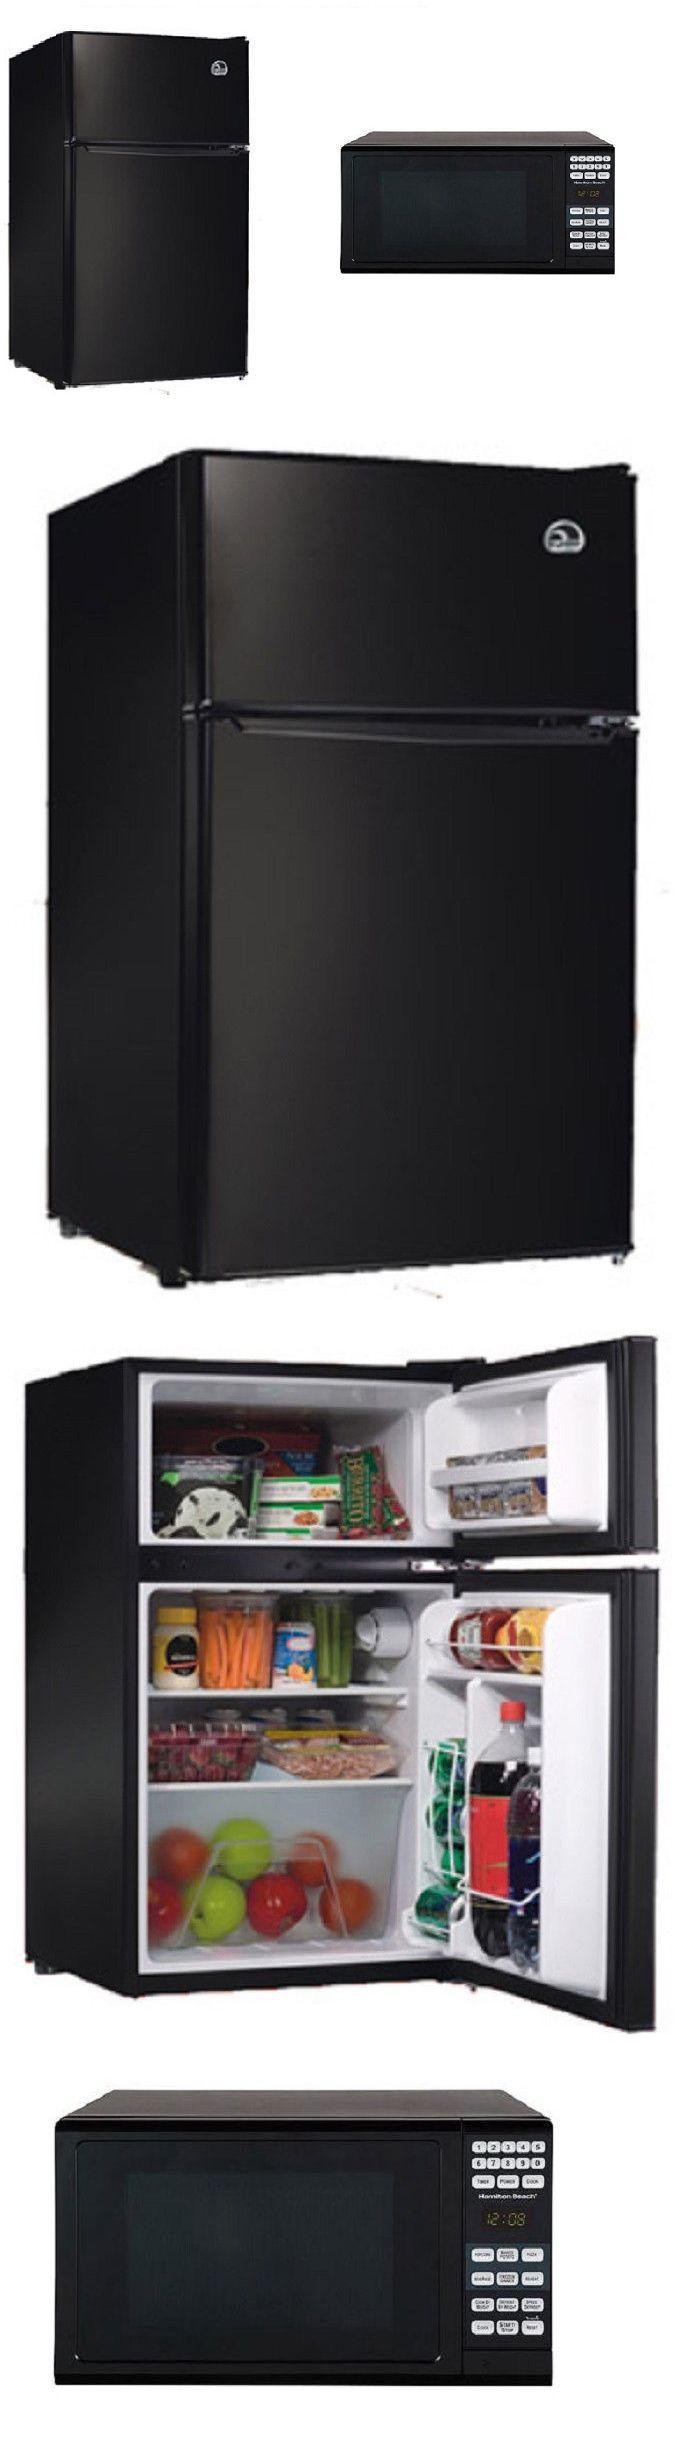 Mini Fridges 71262: Refrigerator Mini Fridge Microwave Combo Freezer Black Dorm Office Drink Cooler -> BUY IT NOW ONLY: $247.89 on eBay!